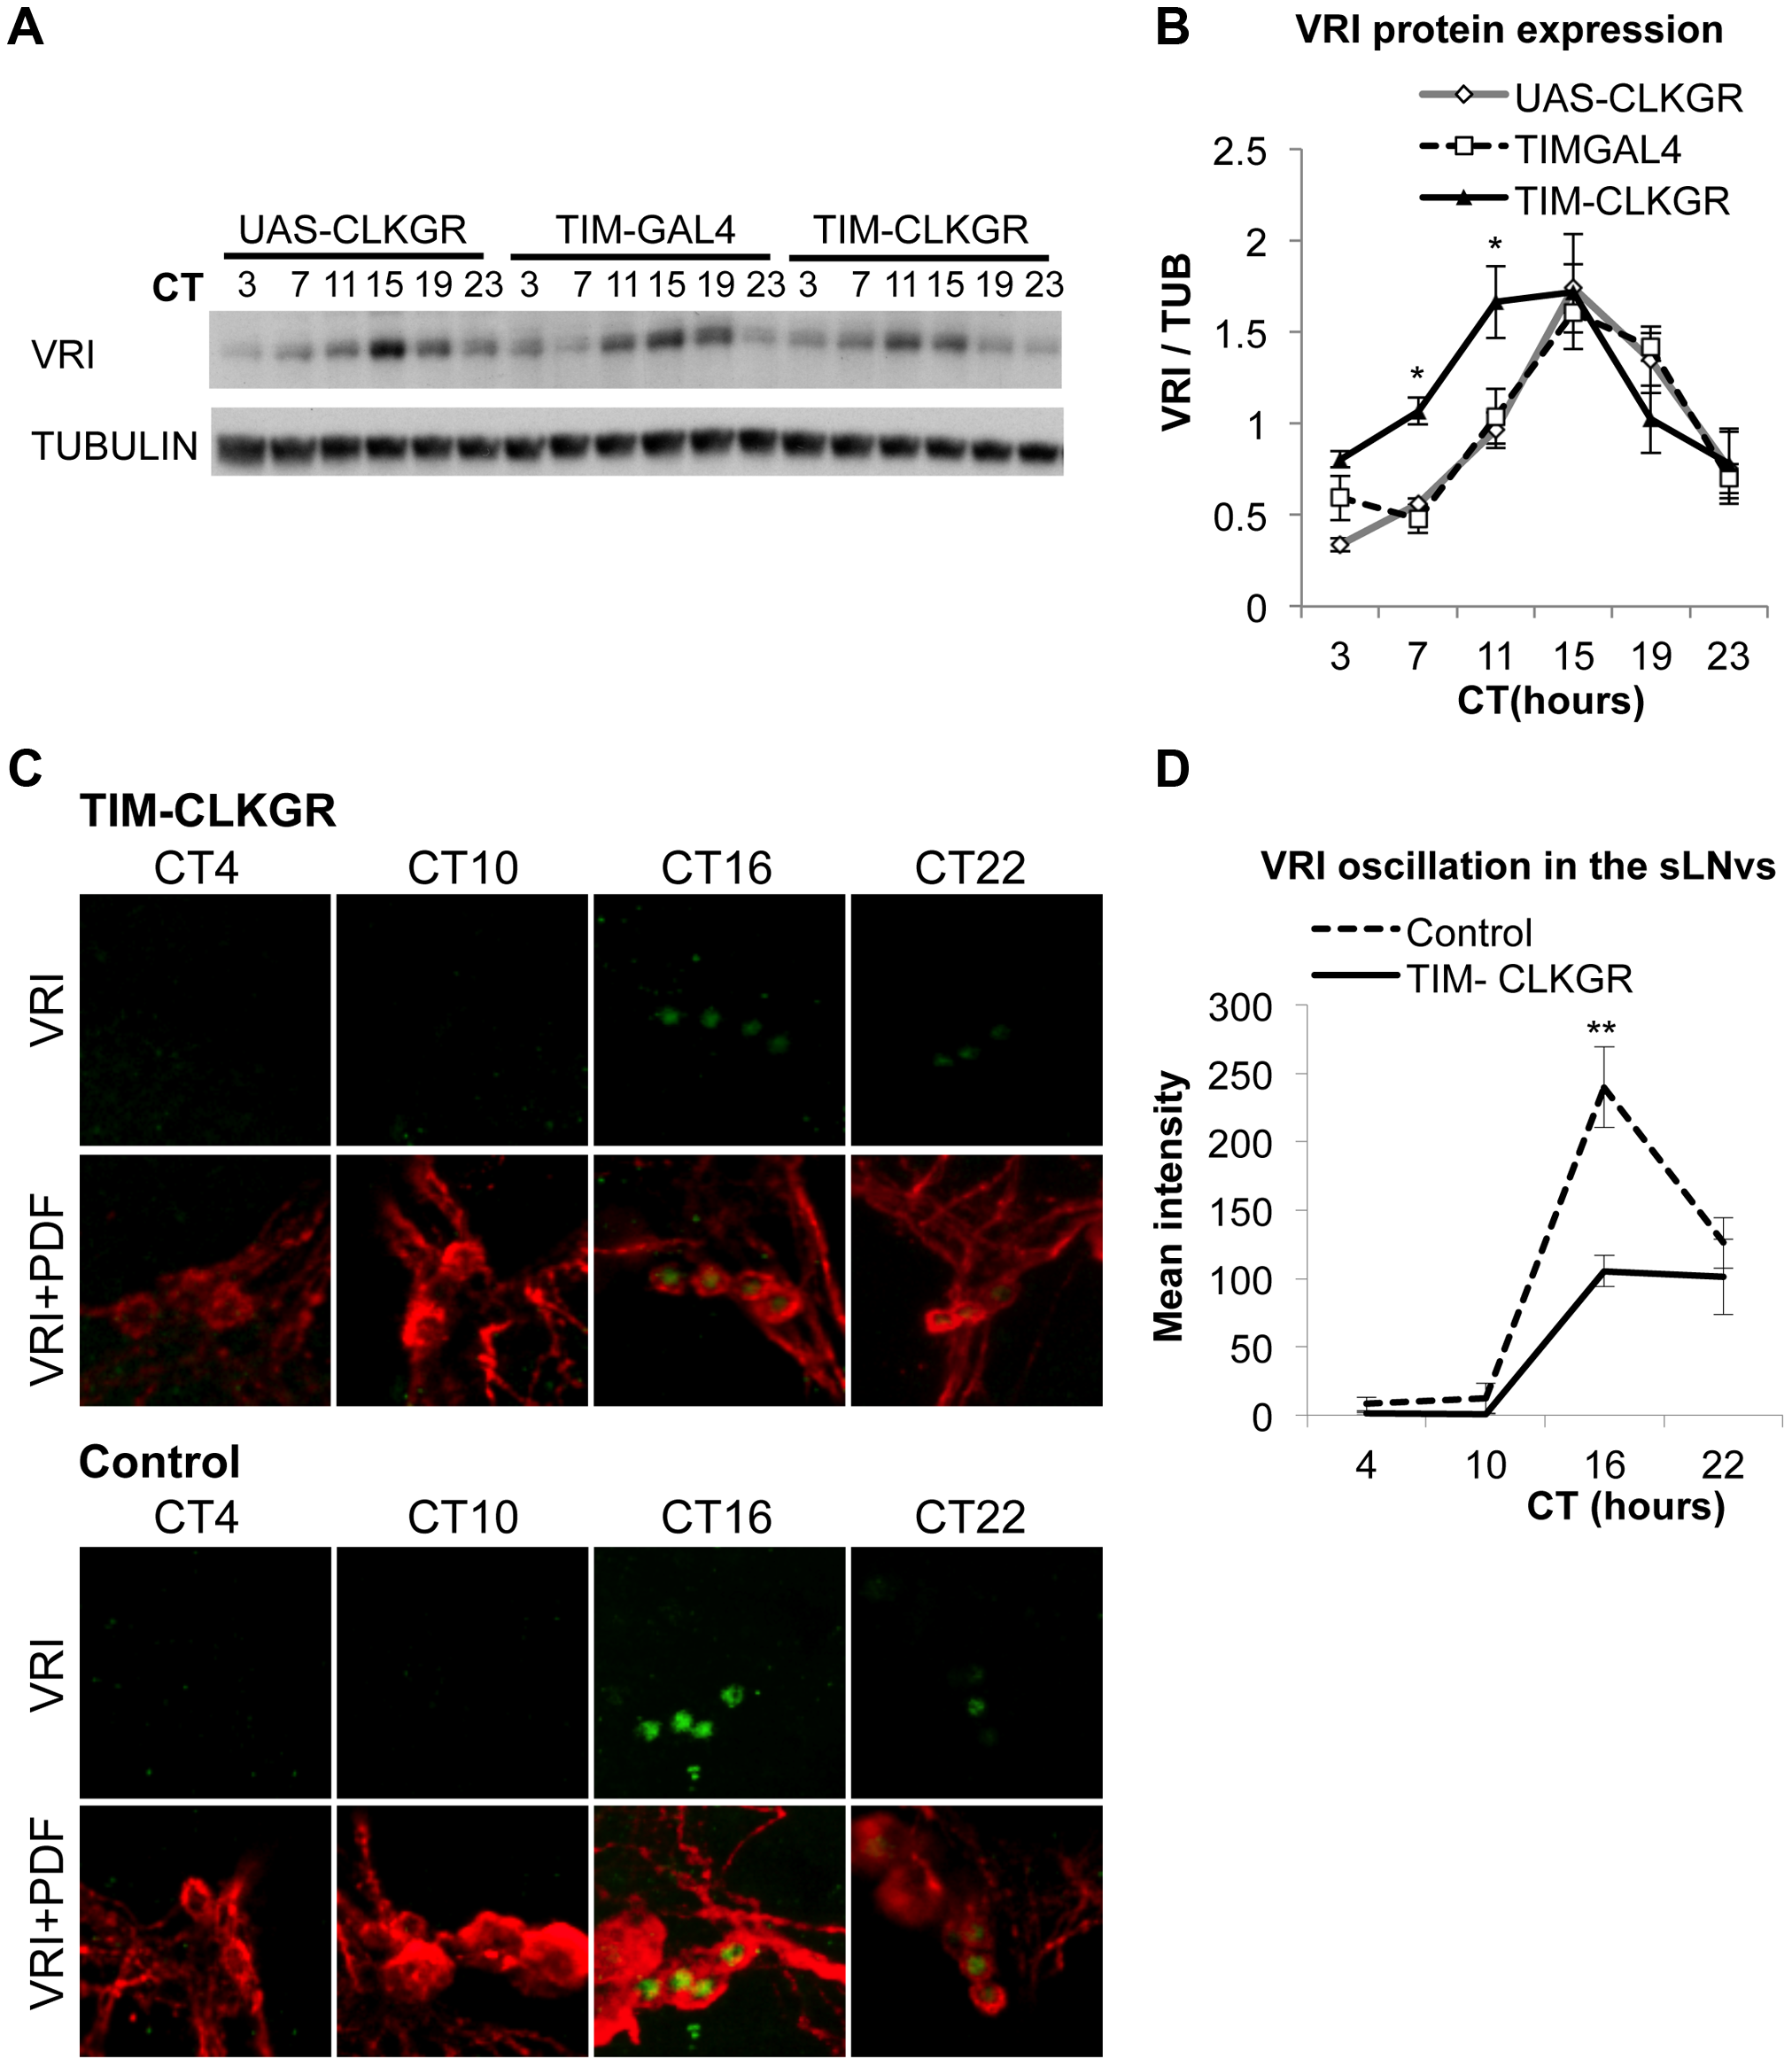 TIM-CLKGR flies display low amplitude circadian protein oscillations.